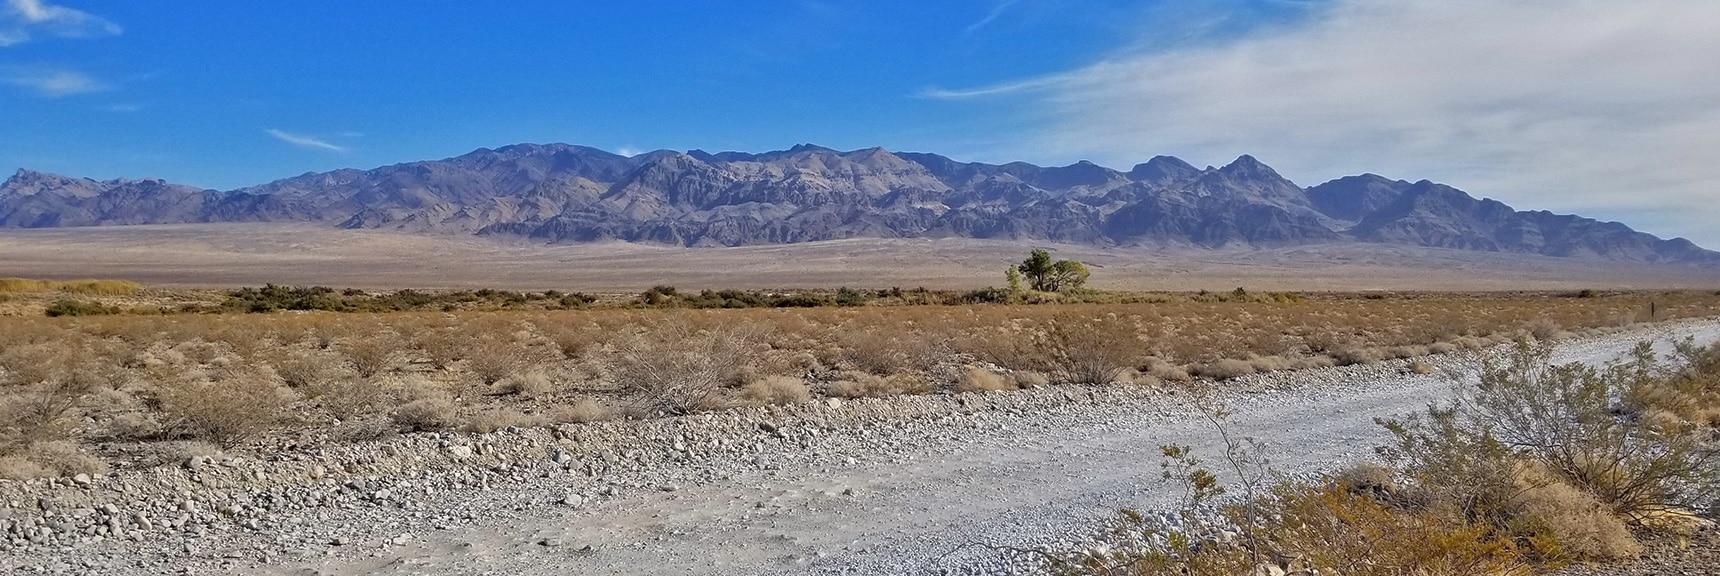 Looking Up Mormon Well Road Toward the Sheep Range | Smart Car Bike Rack and Mountain Bike Test, Sheep Range, Nevada